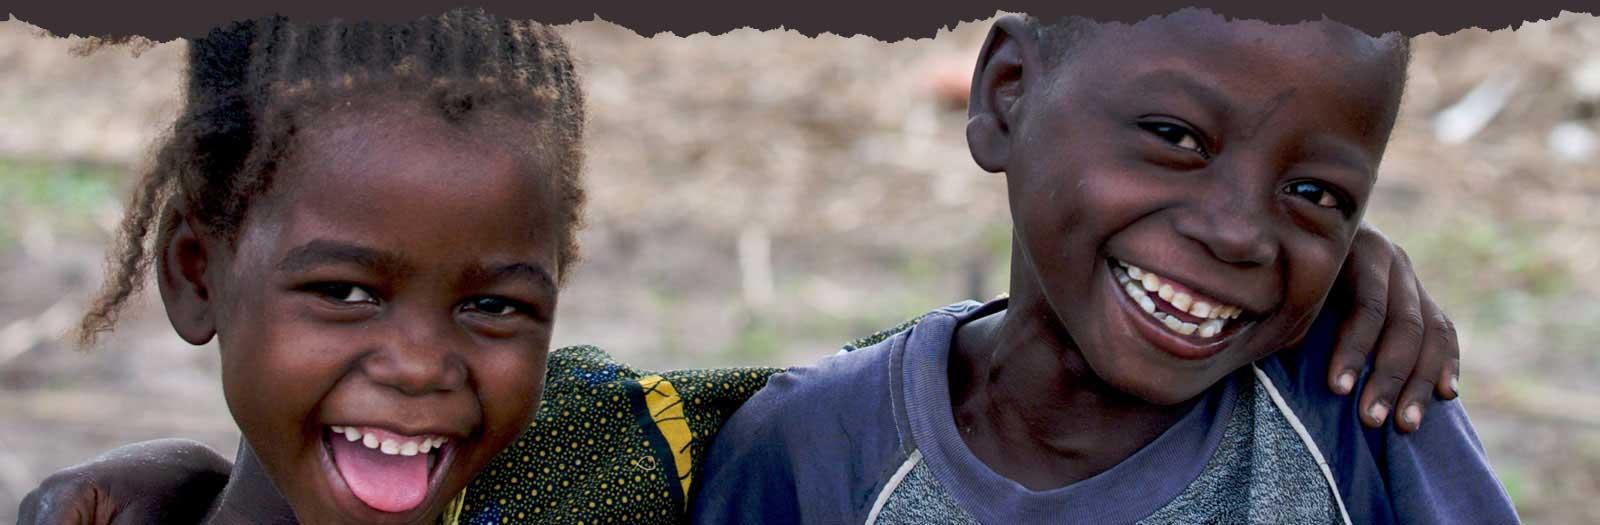 Estremamente bambini-africani-sorridenti - AIS Seguimi onlus KW01